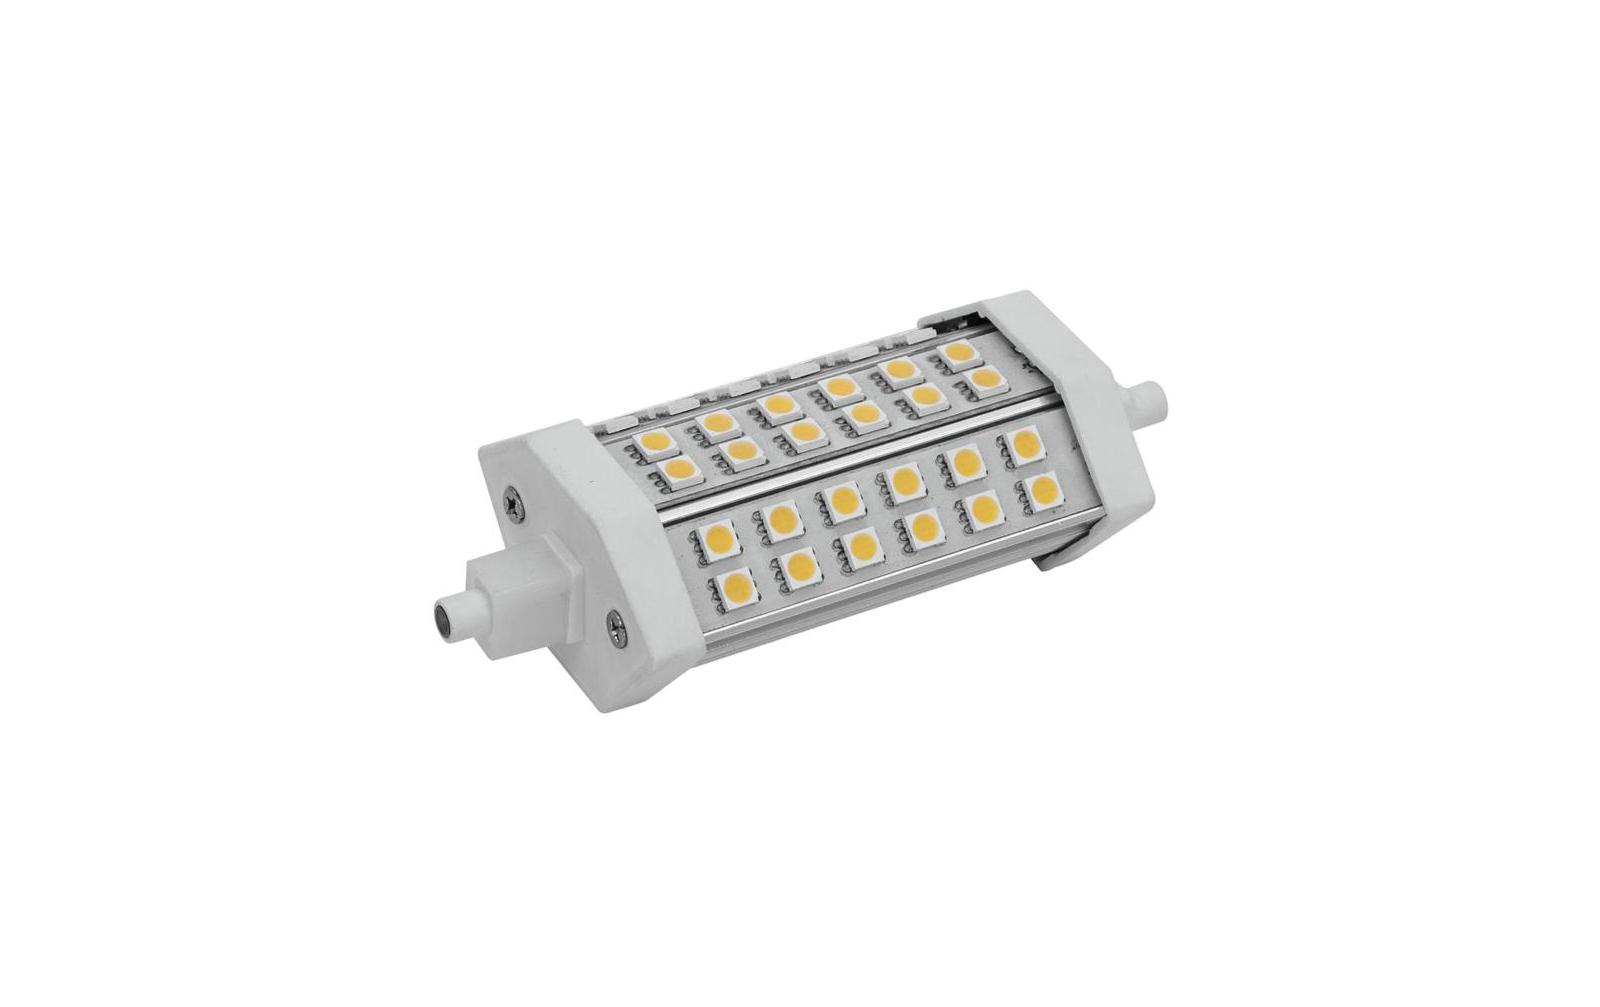 omnilux-led-r7s-230v-8w-6400k-smd5050-dimmbar